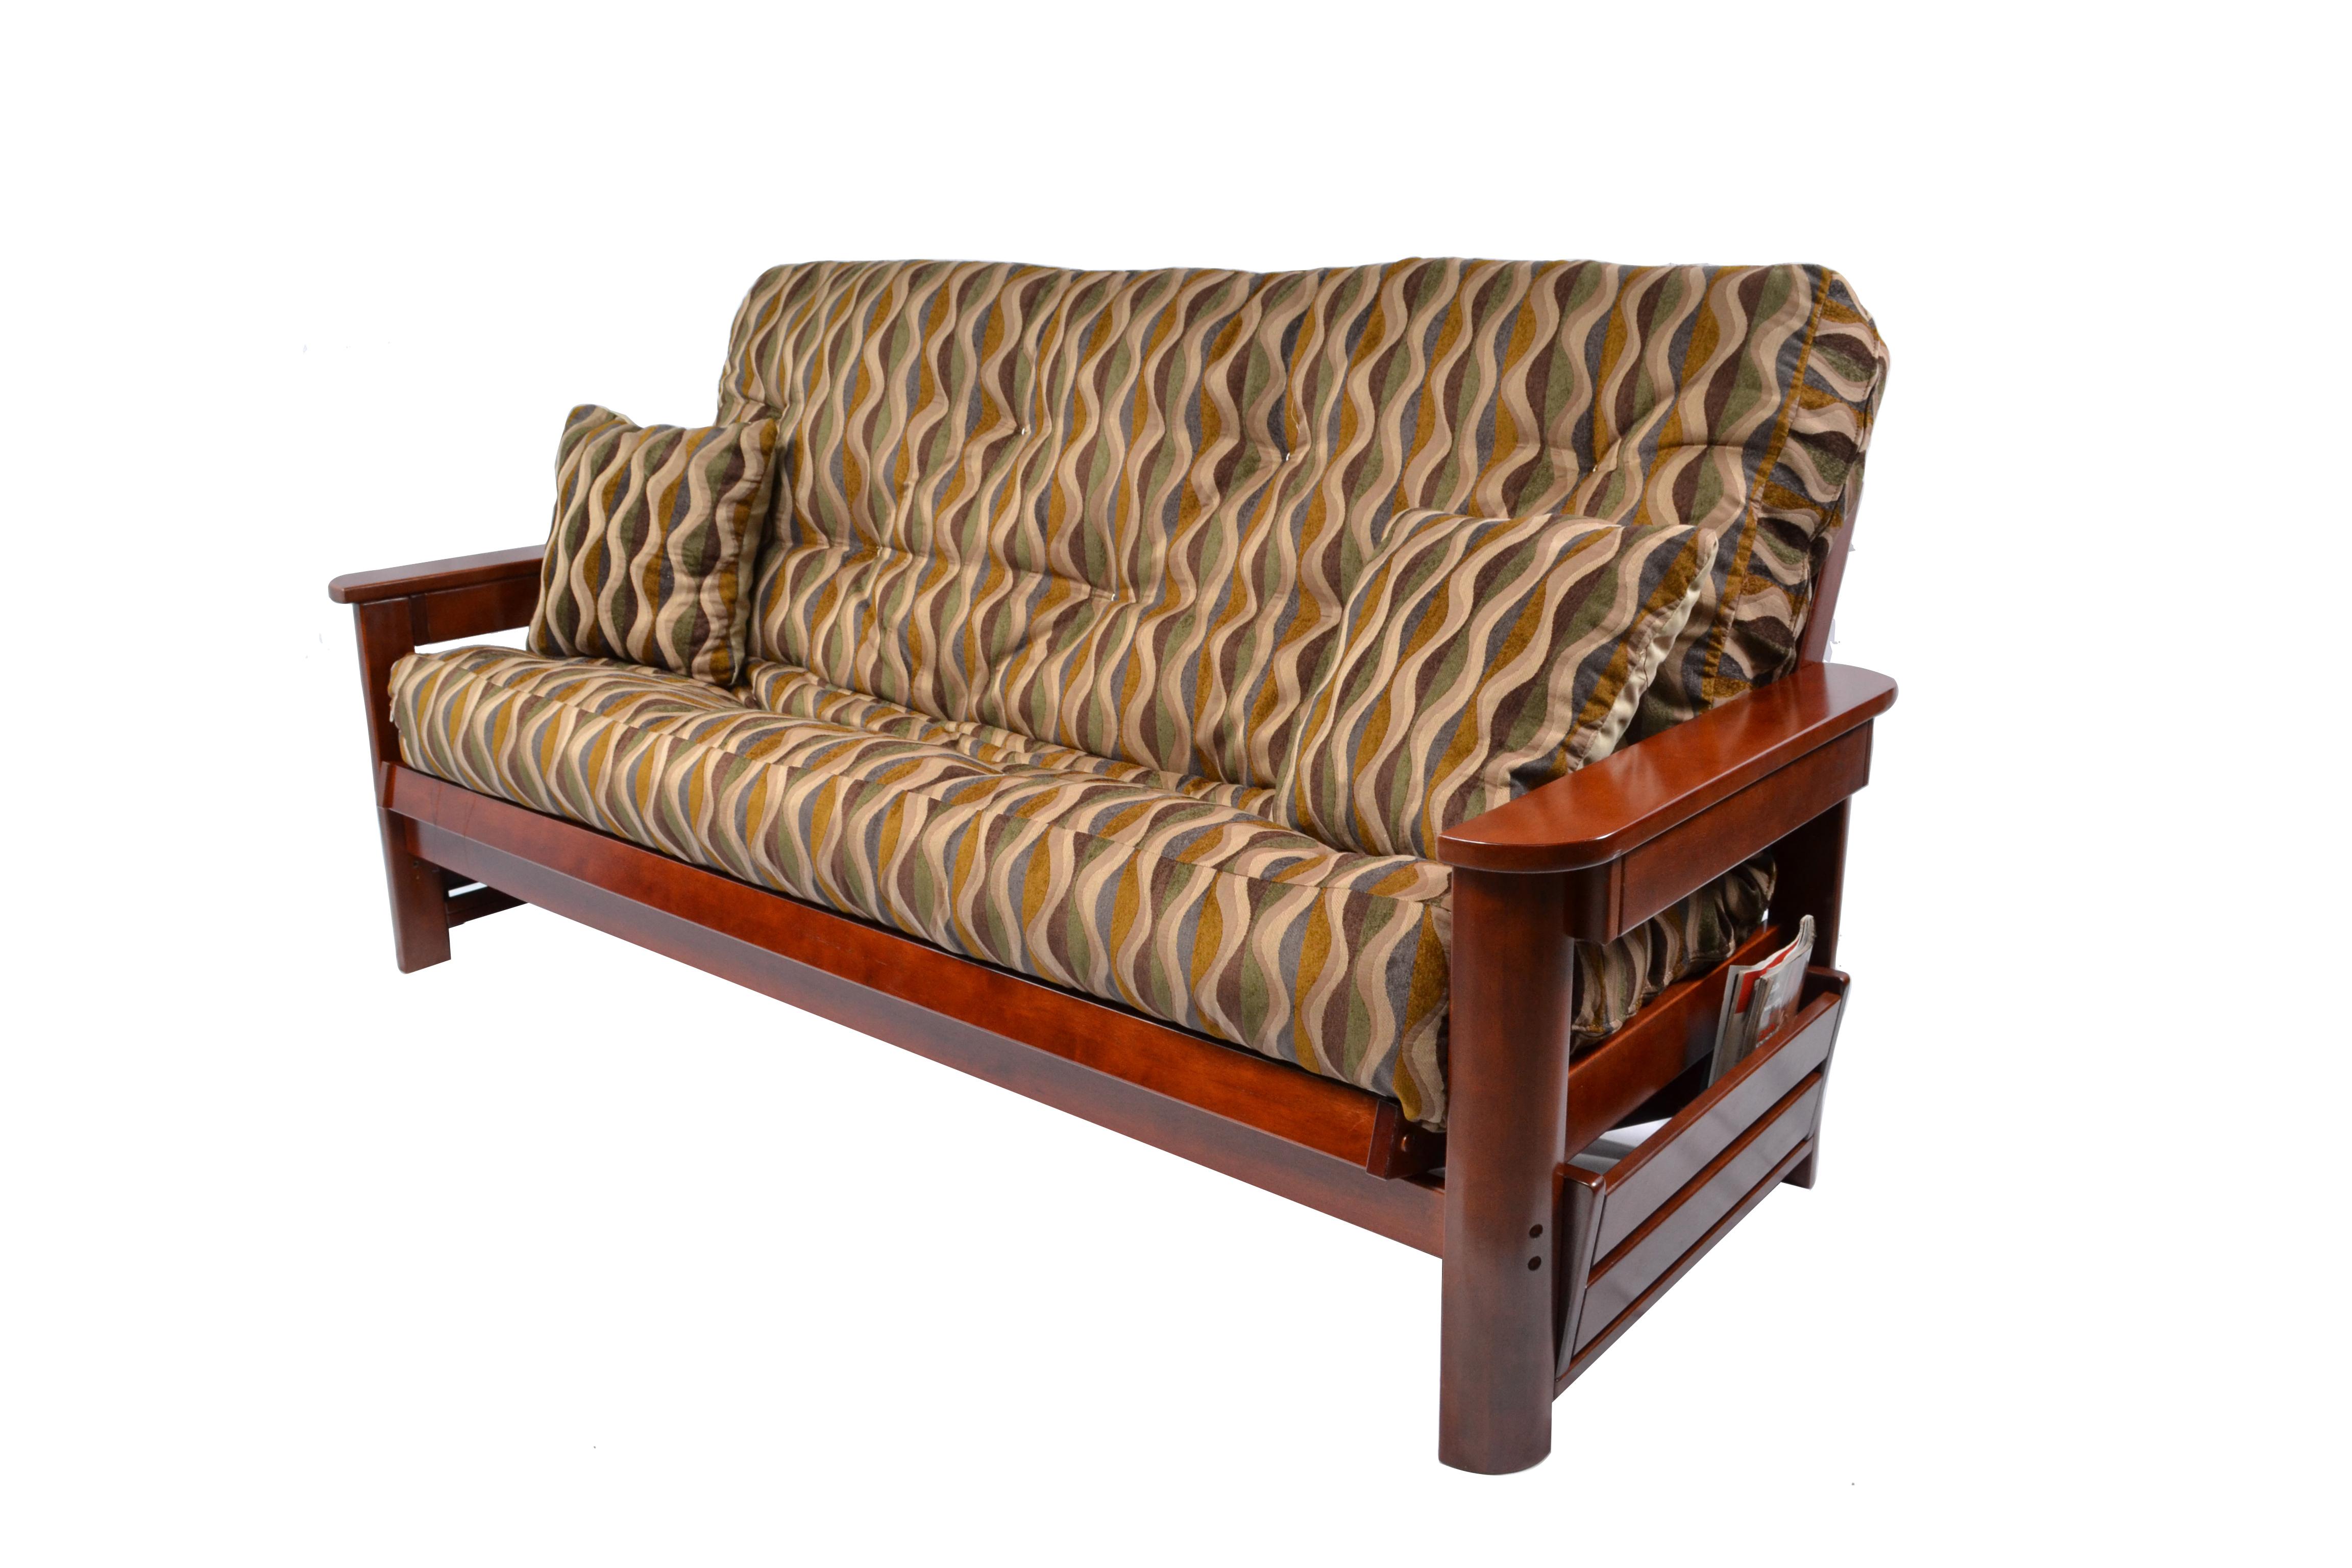 Learn About Hardwood Futon The Futon Store Memphis Tn